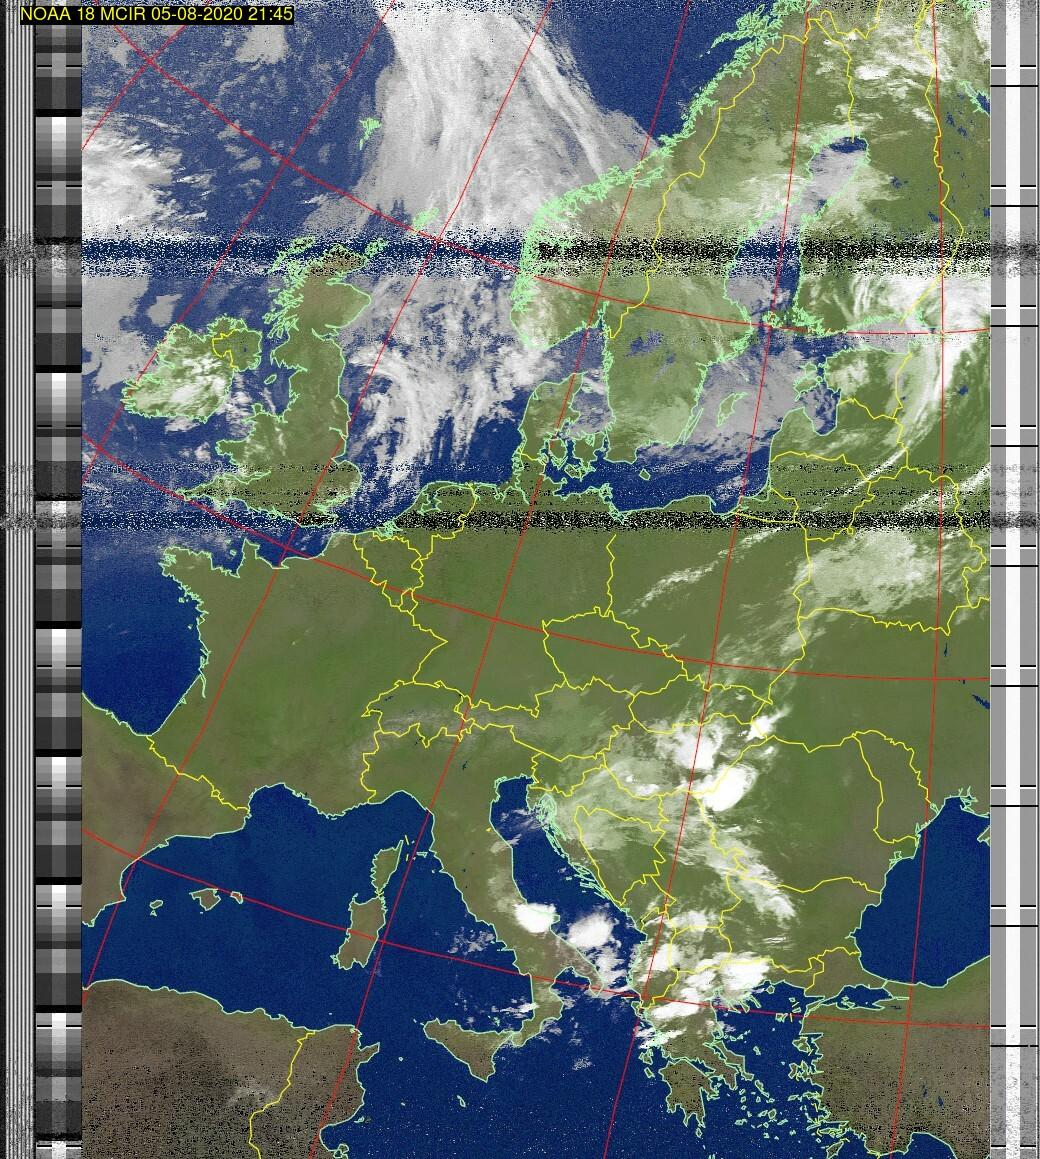 Wetter Satellit: NOAA 18 05-08-2020 21:45. Elevation maximal: 77 Grad. #NOAA #weather #noaasatellite #clima #wxtoimg #rtlsdr #raspberrypi #germany #wetterpic.twitter.com/BHpZKzM5T8